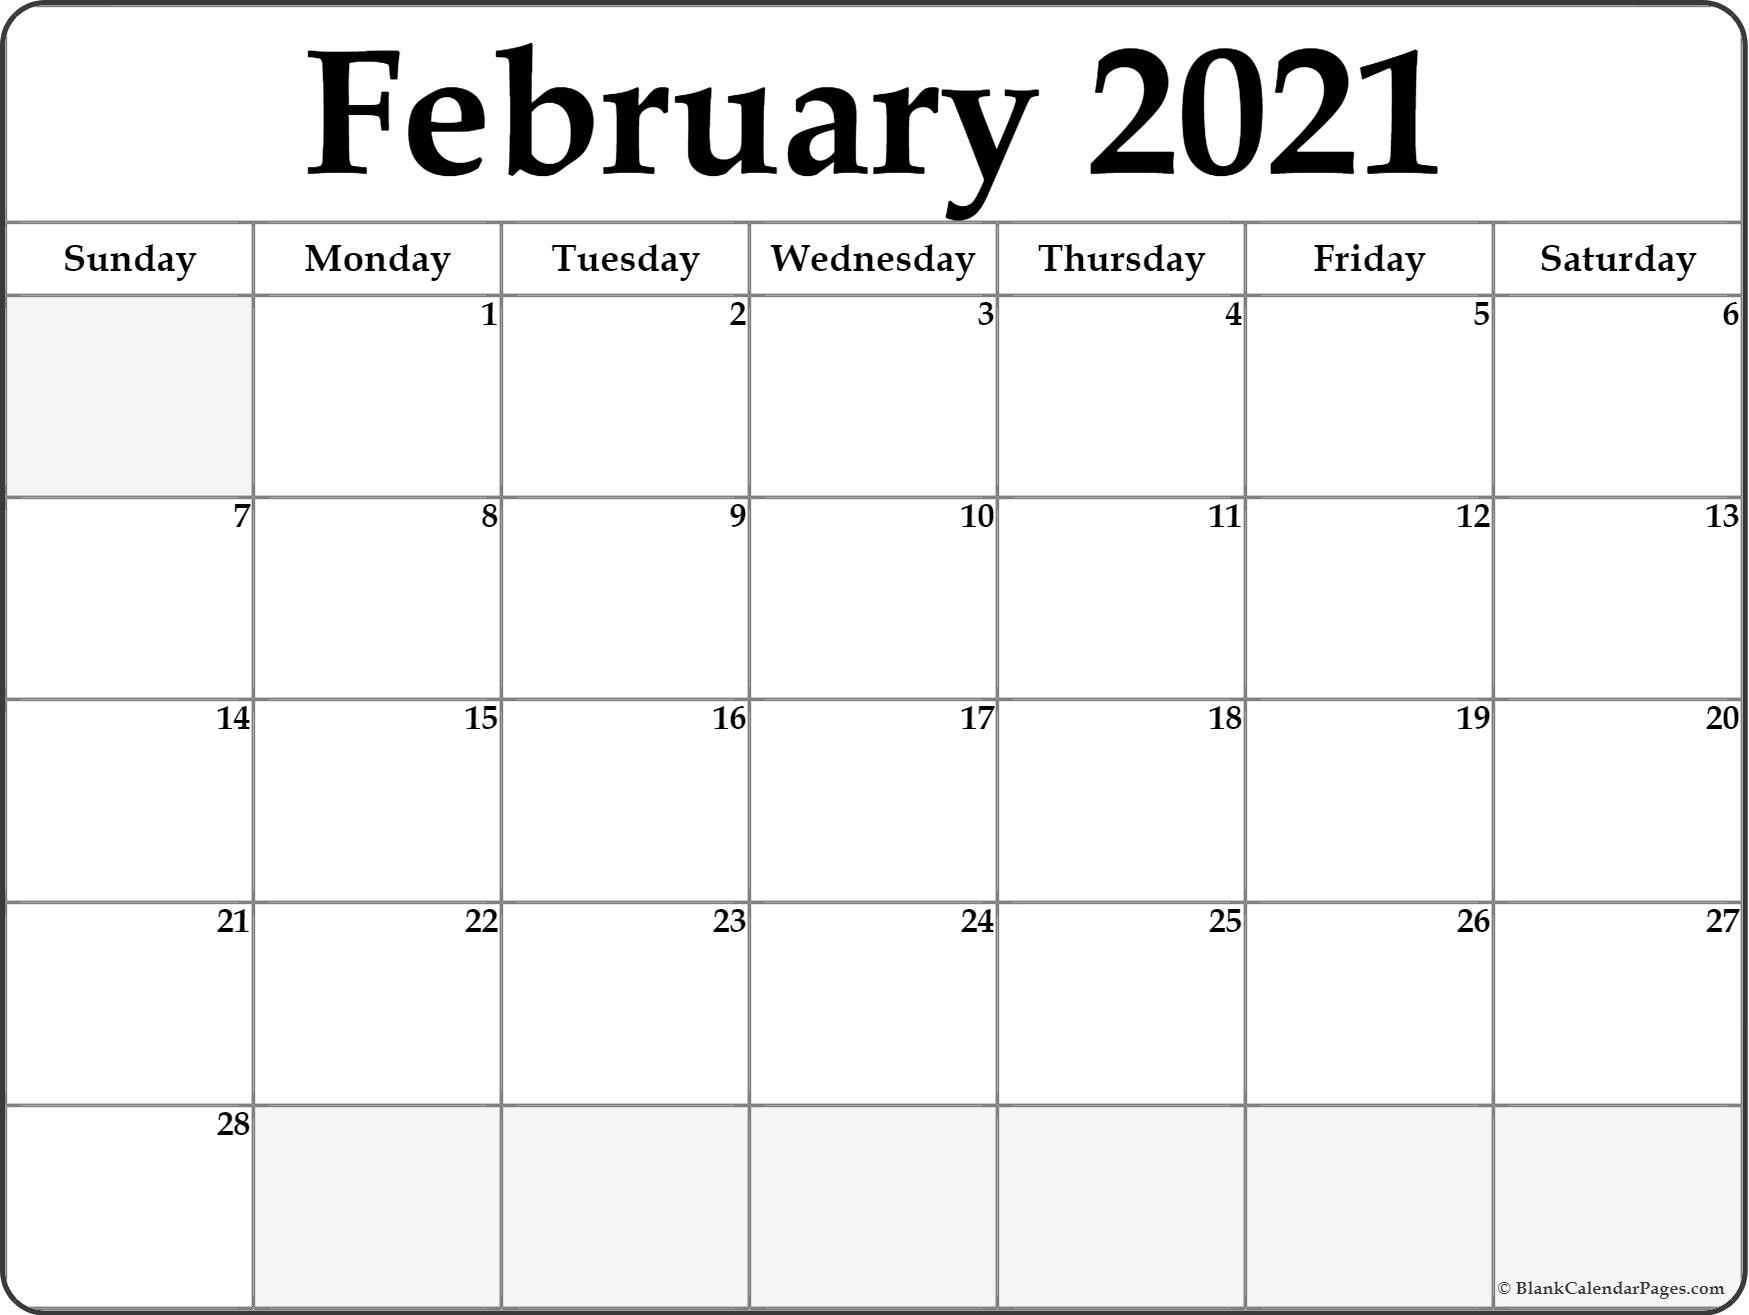 Editable Calendar February 2021 Calendar February 2021 Editable Planner in 2020 | February